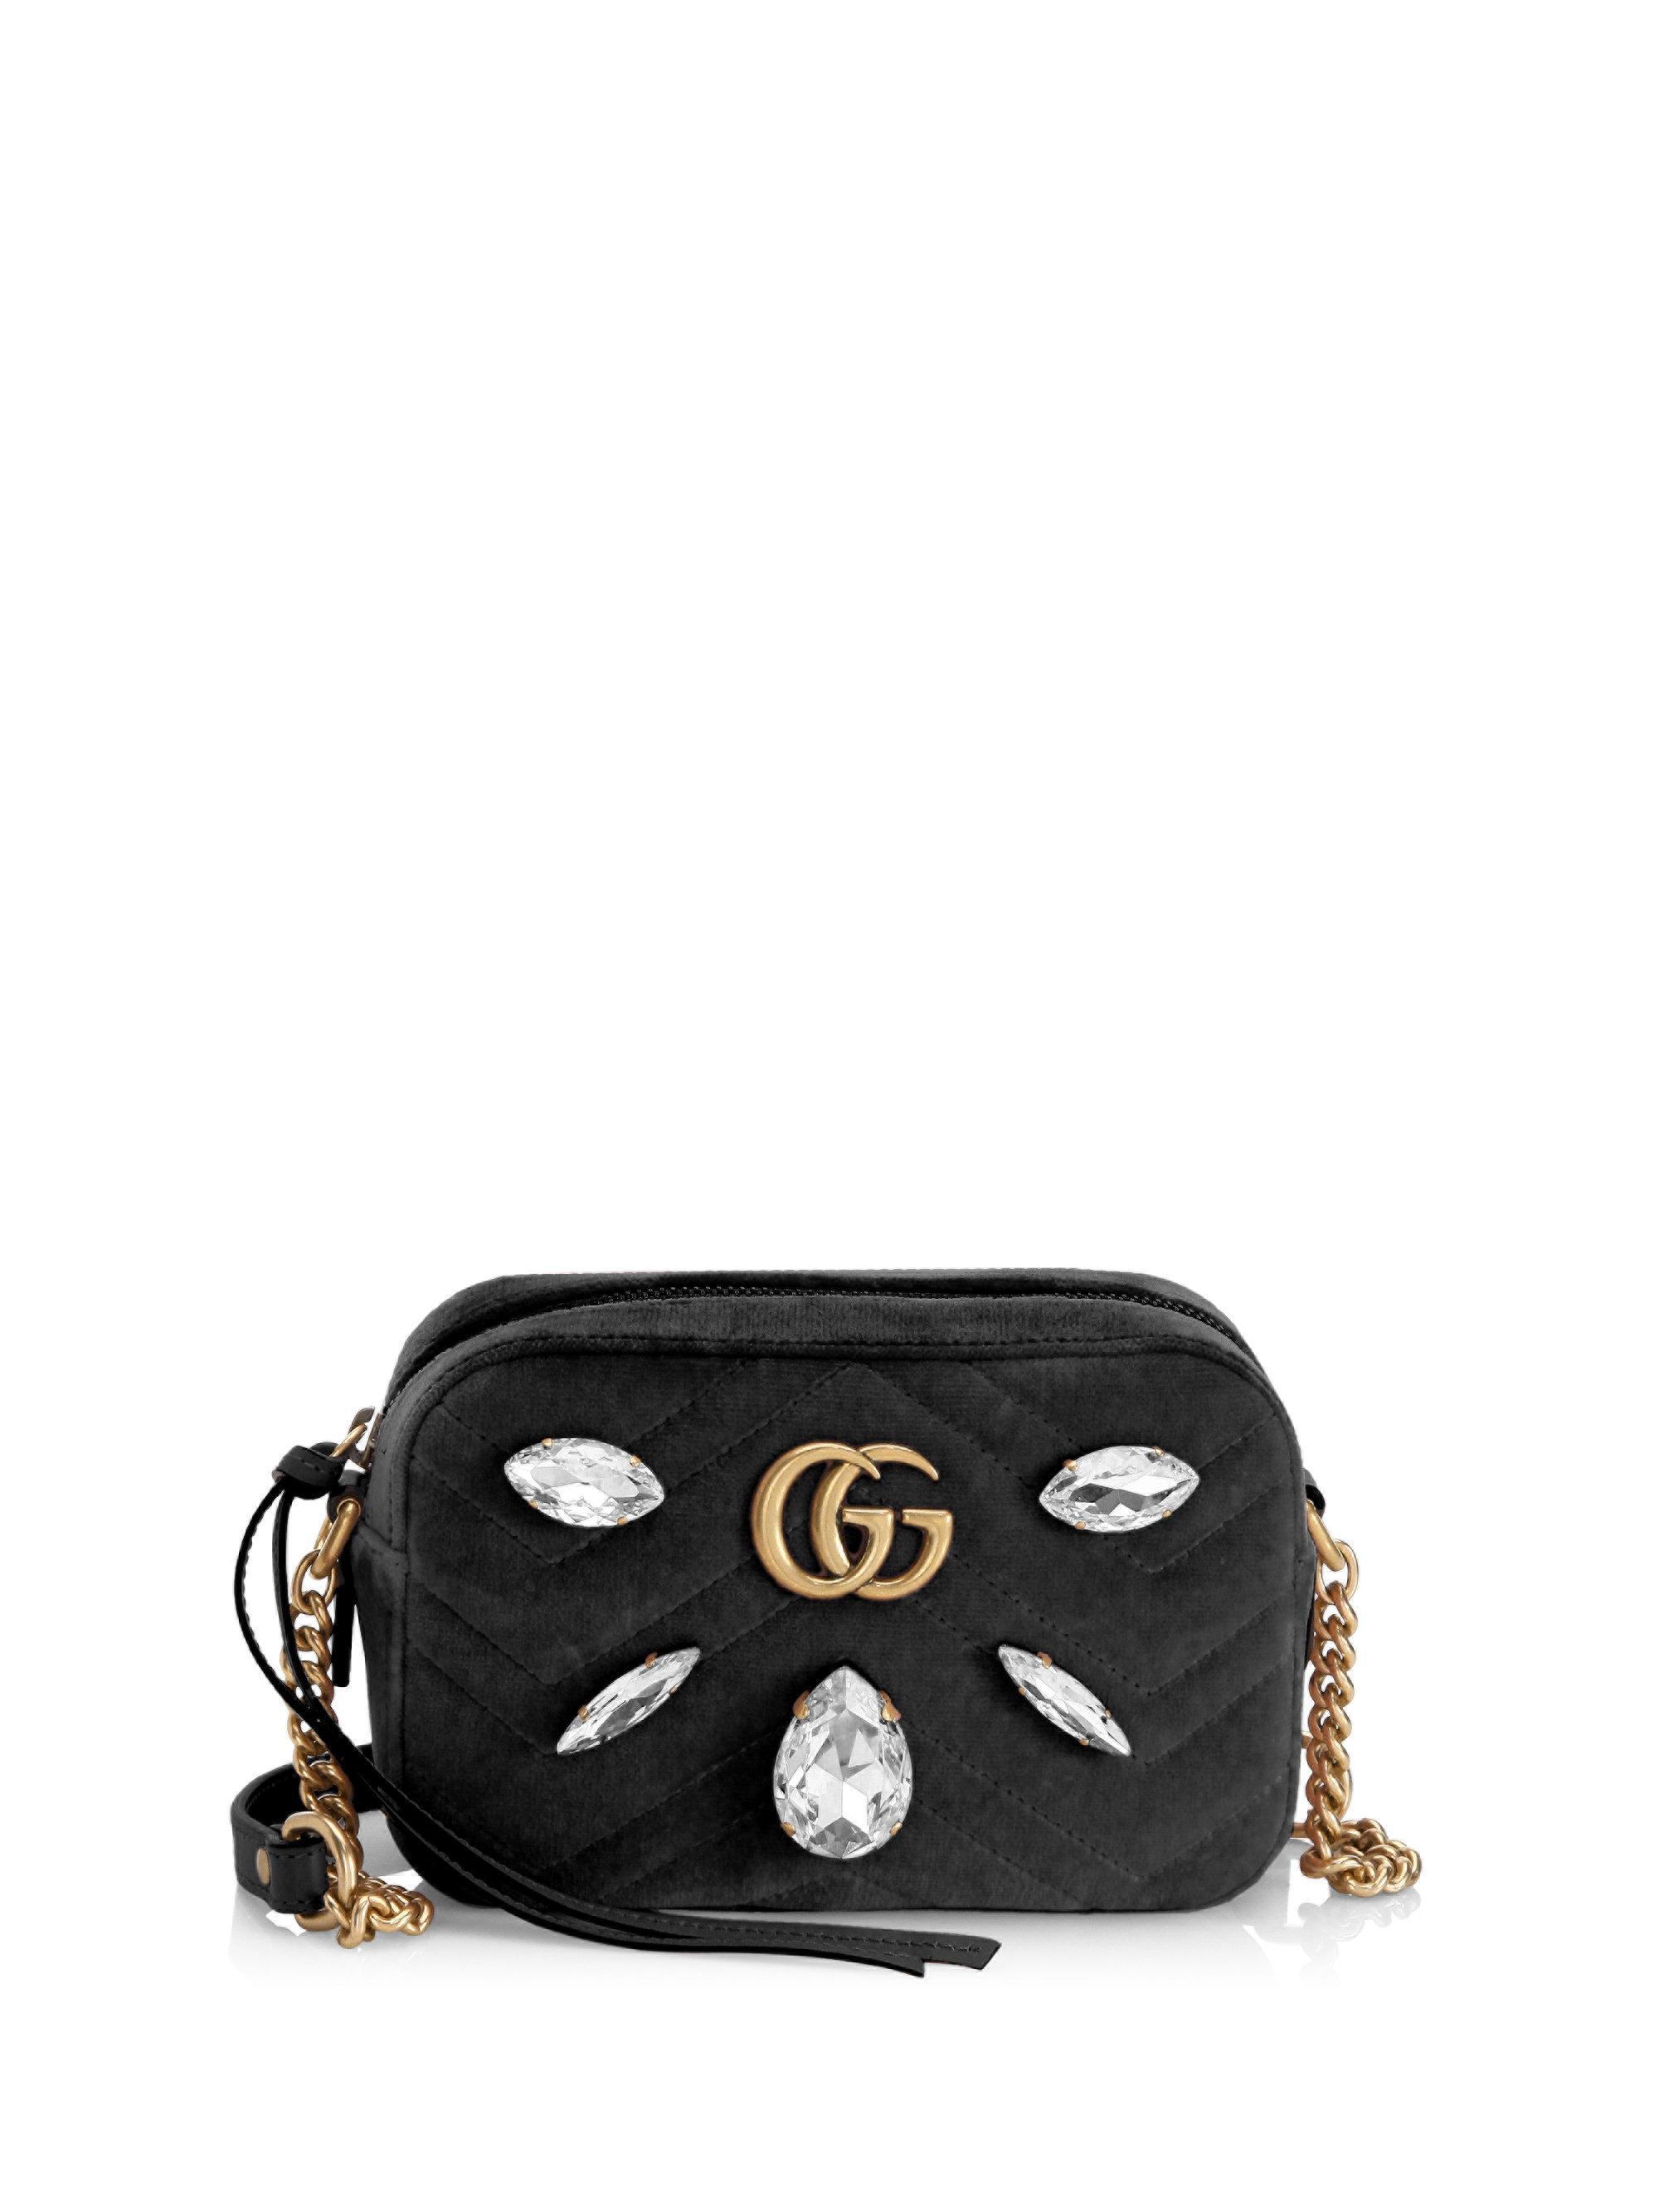 0a0c453230d Lyst - Gucci Gg Marmont Velvet Mini Bag in Black